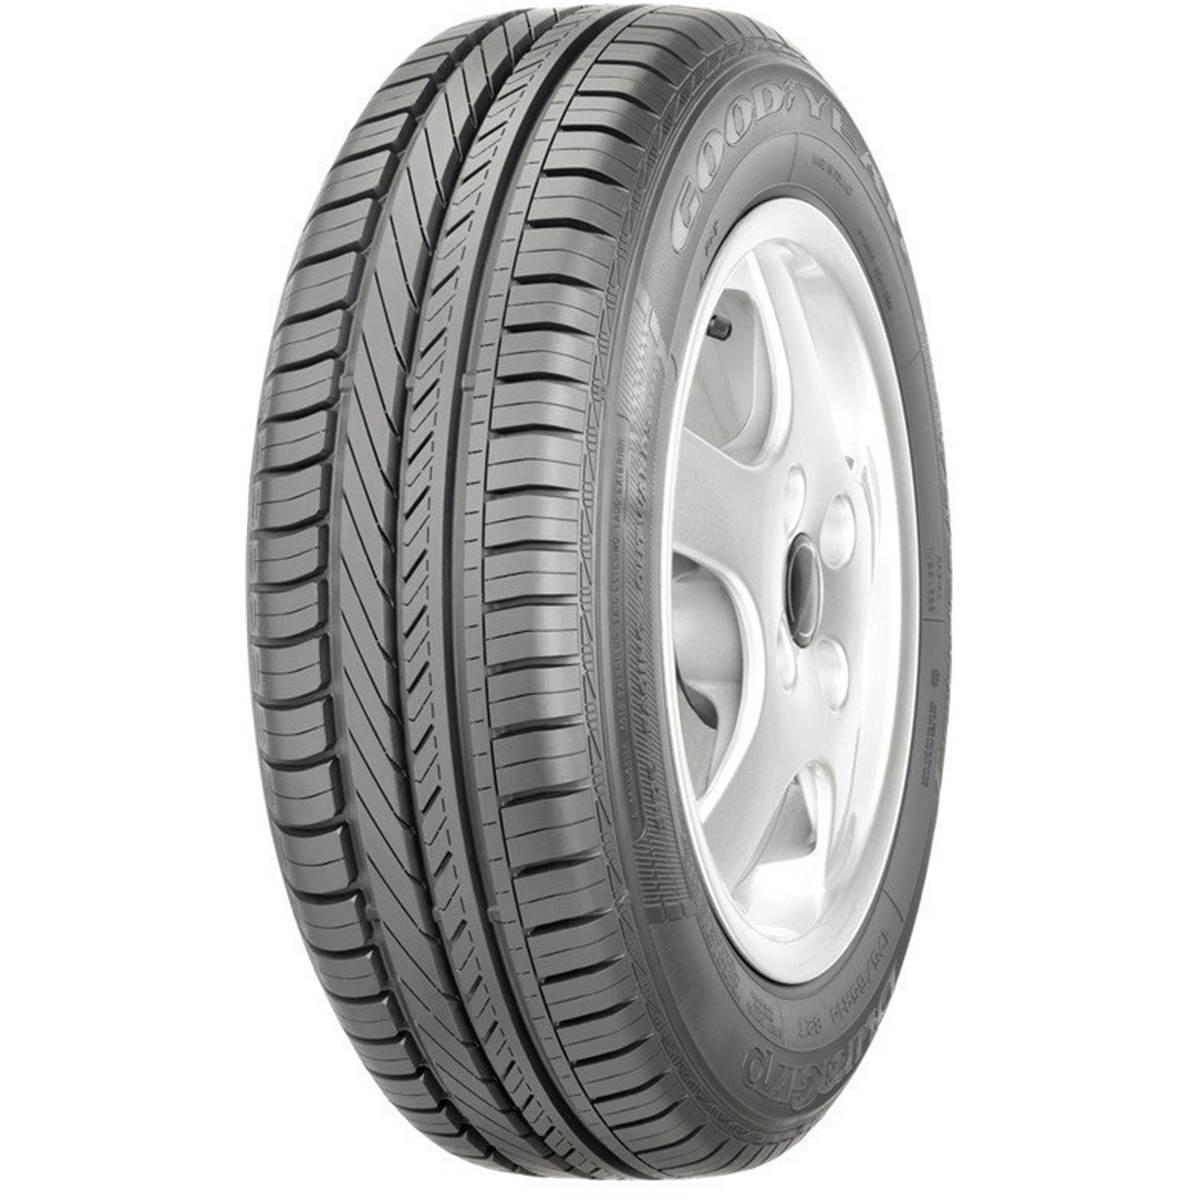 goodyear duragrip 175 65 r14 achat de pneus goodyear duragrip 175 65 r14 pas cher pneu. Black Bedroom Furniture Sets. Home Design Ideas